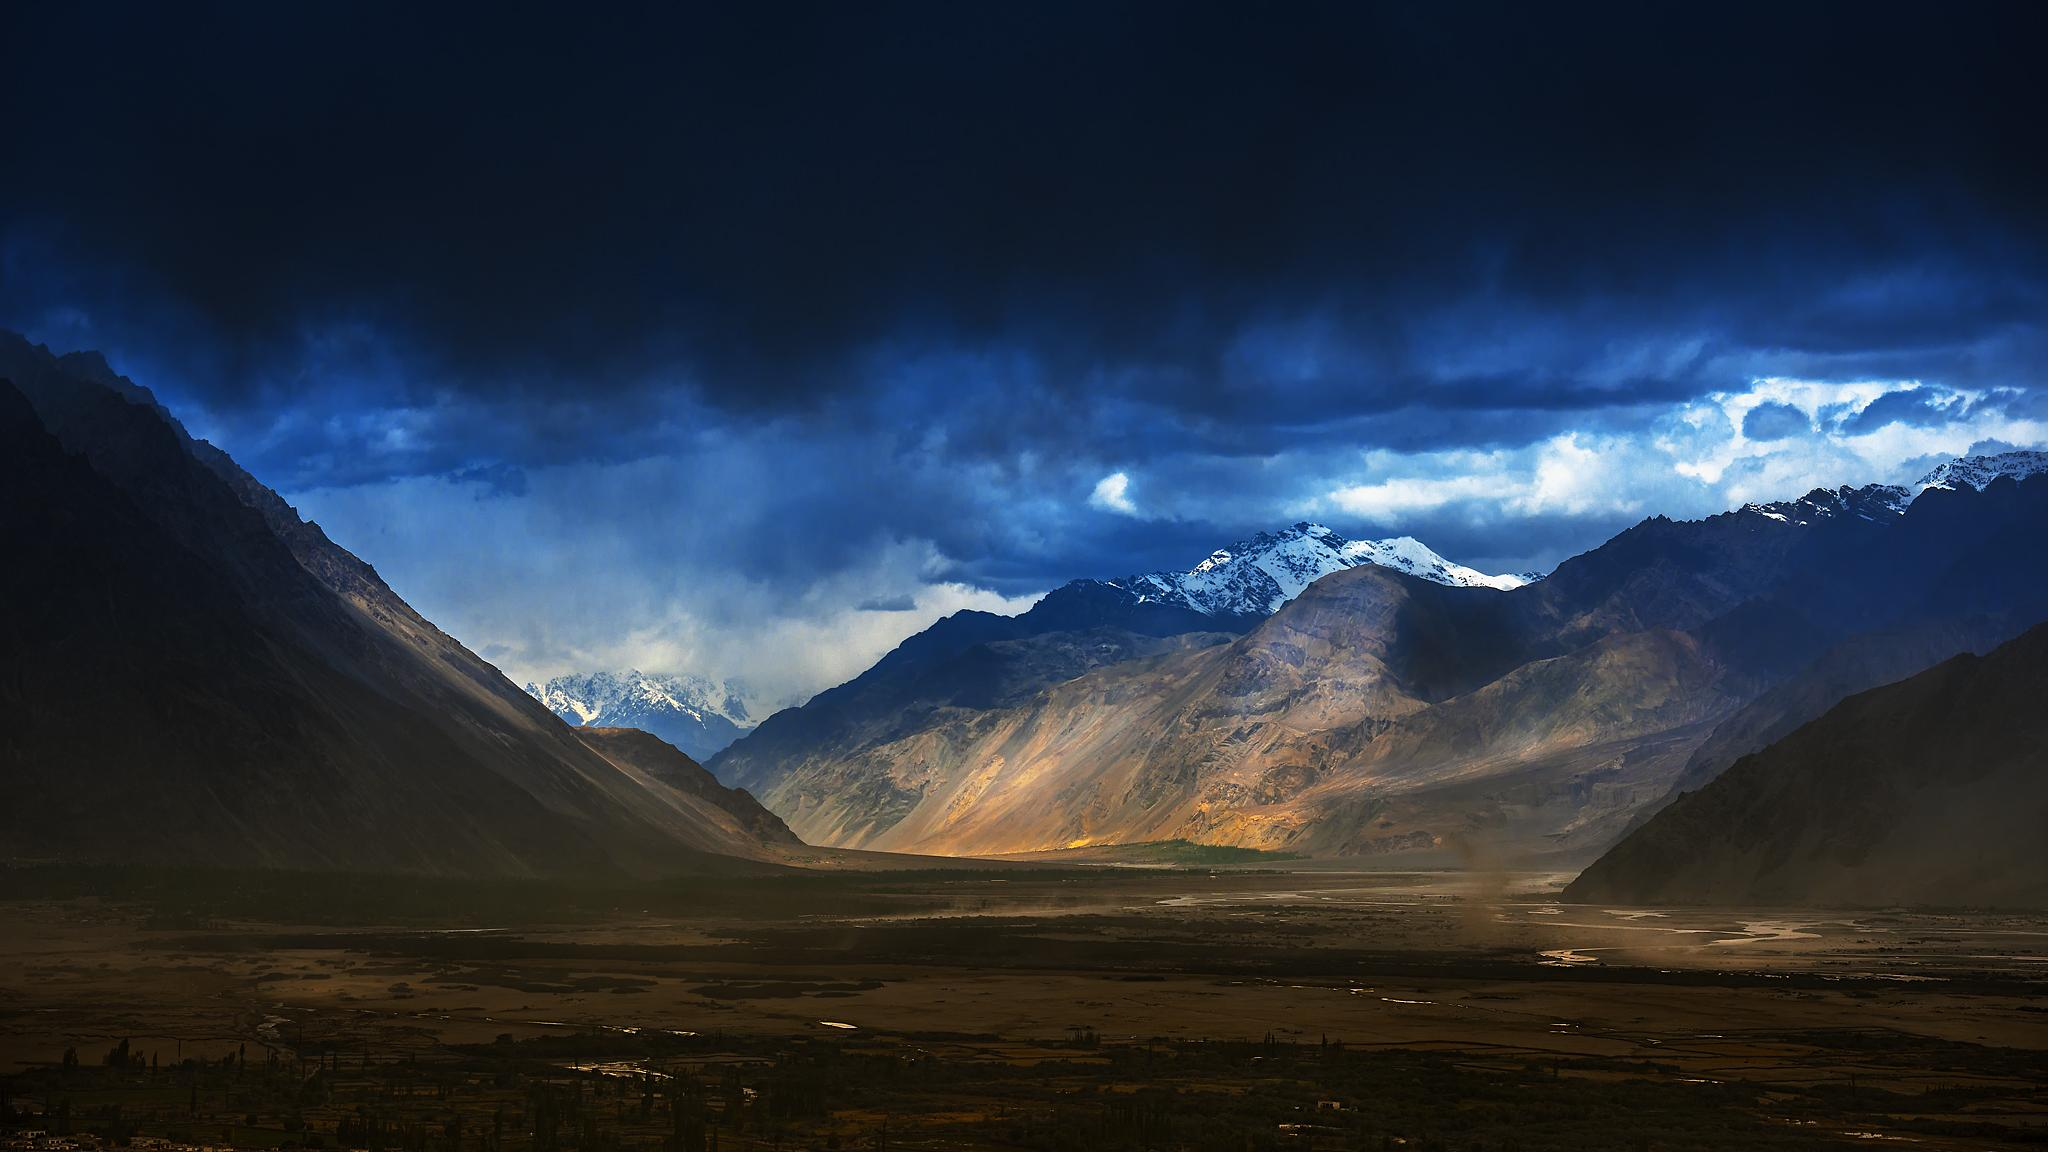 Nubra Valley by Jagjit Singh